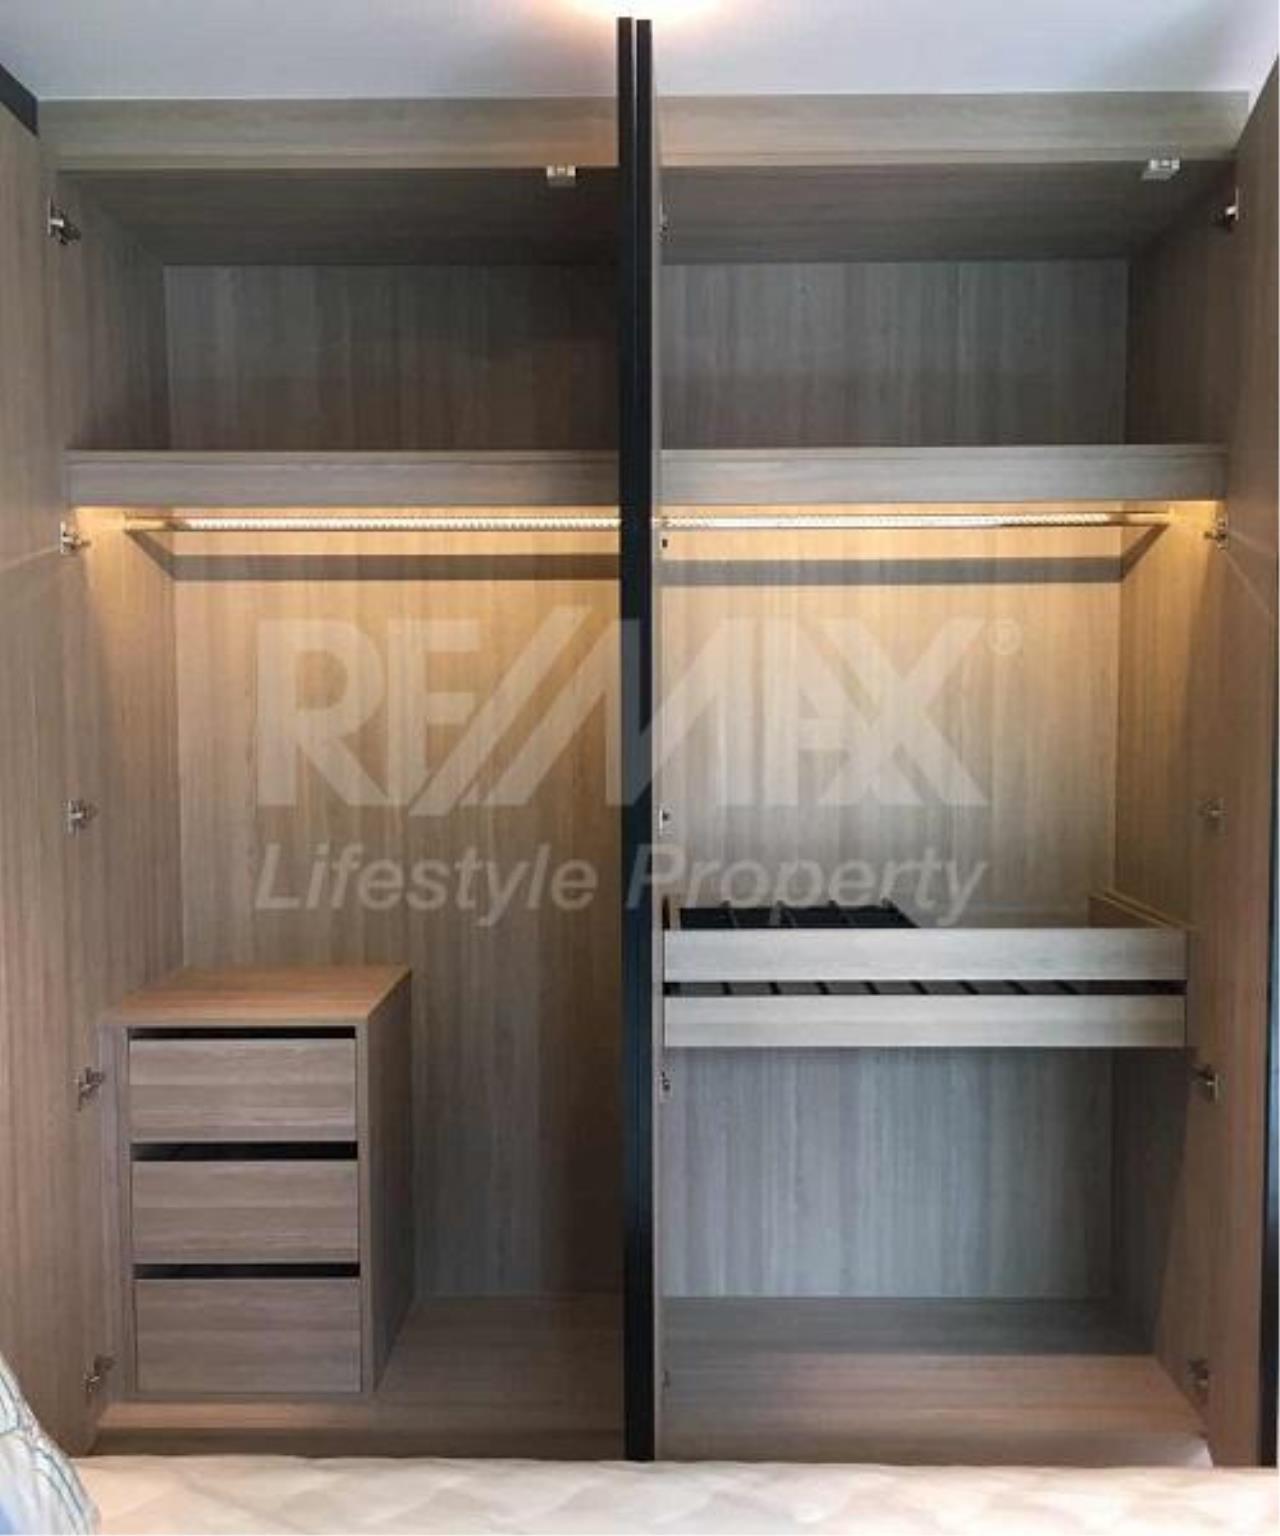 RE/MAX LifeStyle Property Agency's Sky Walk Condominium 8